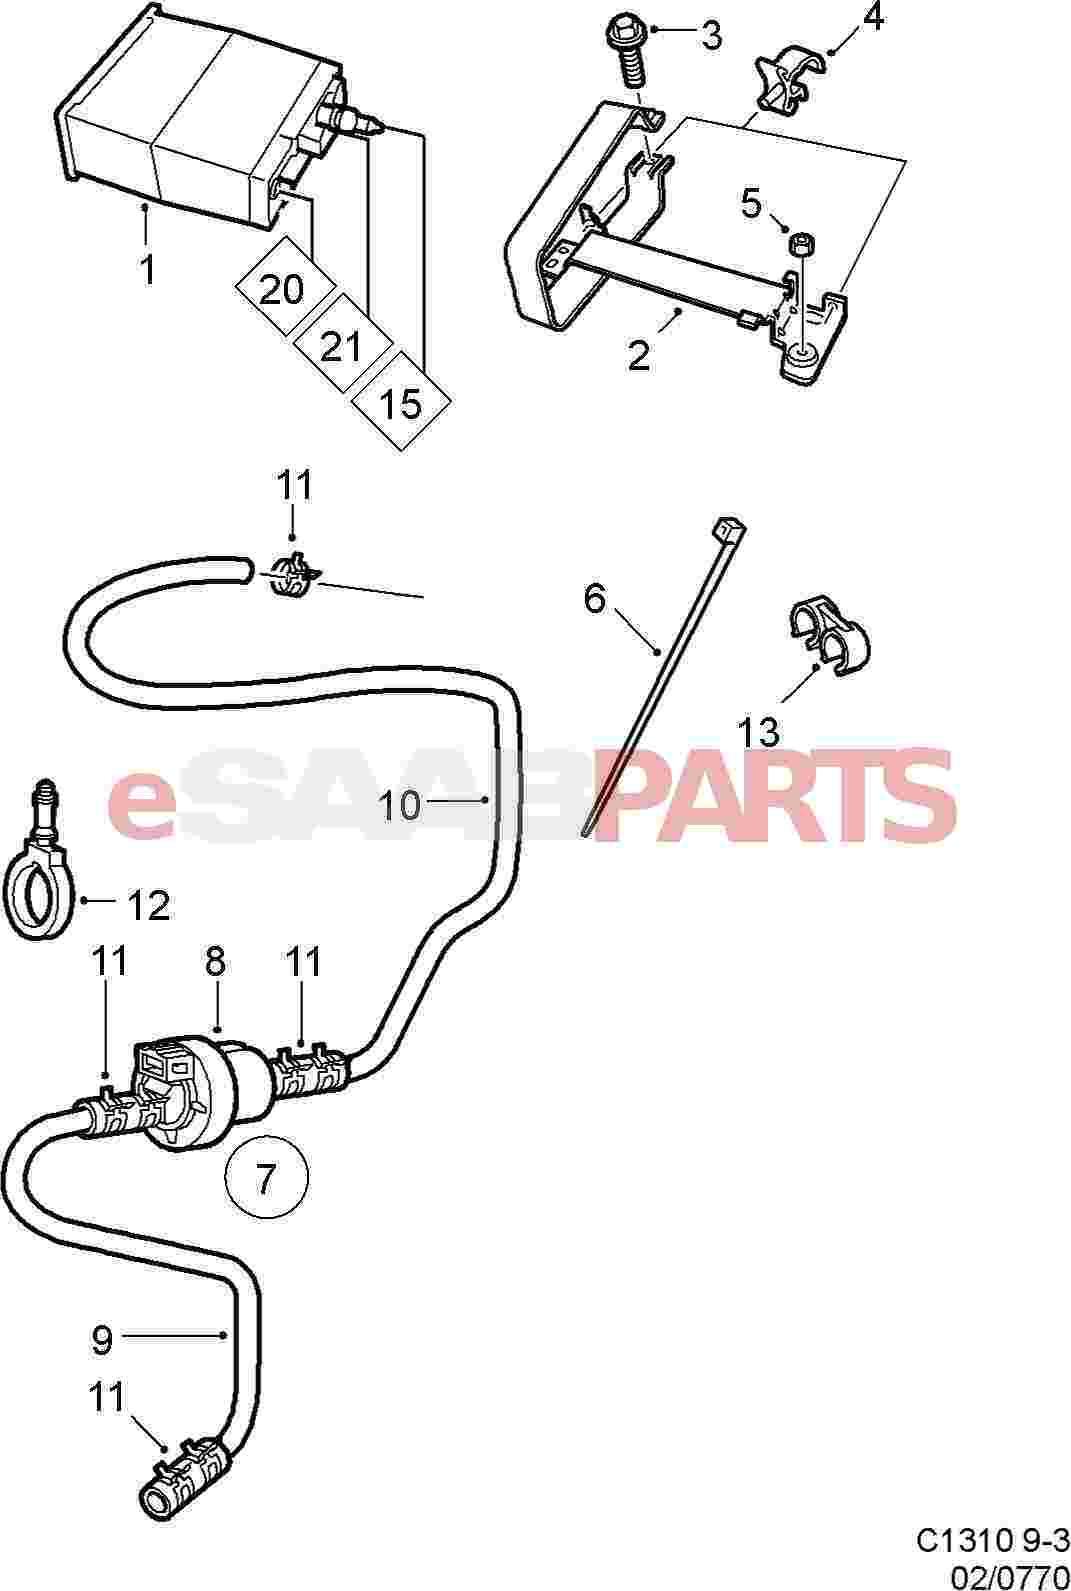 Honda Accord Evap System Diagram Enthusiast Wiring